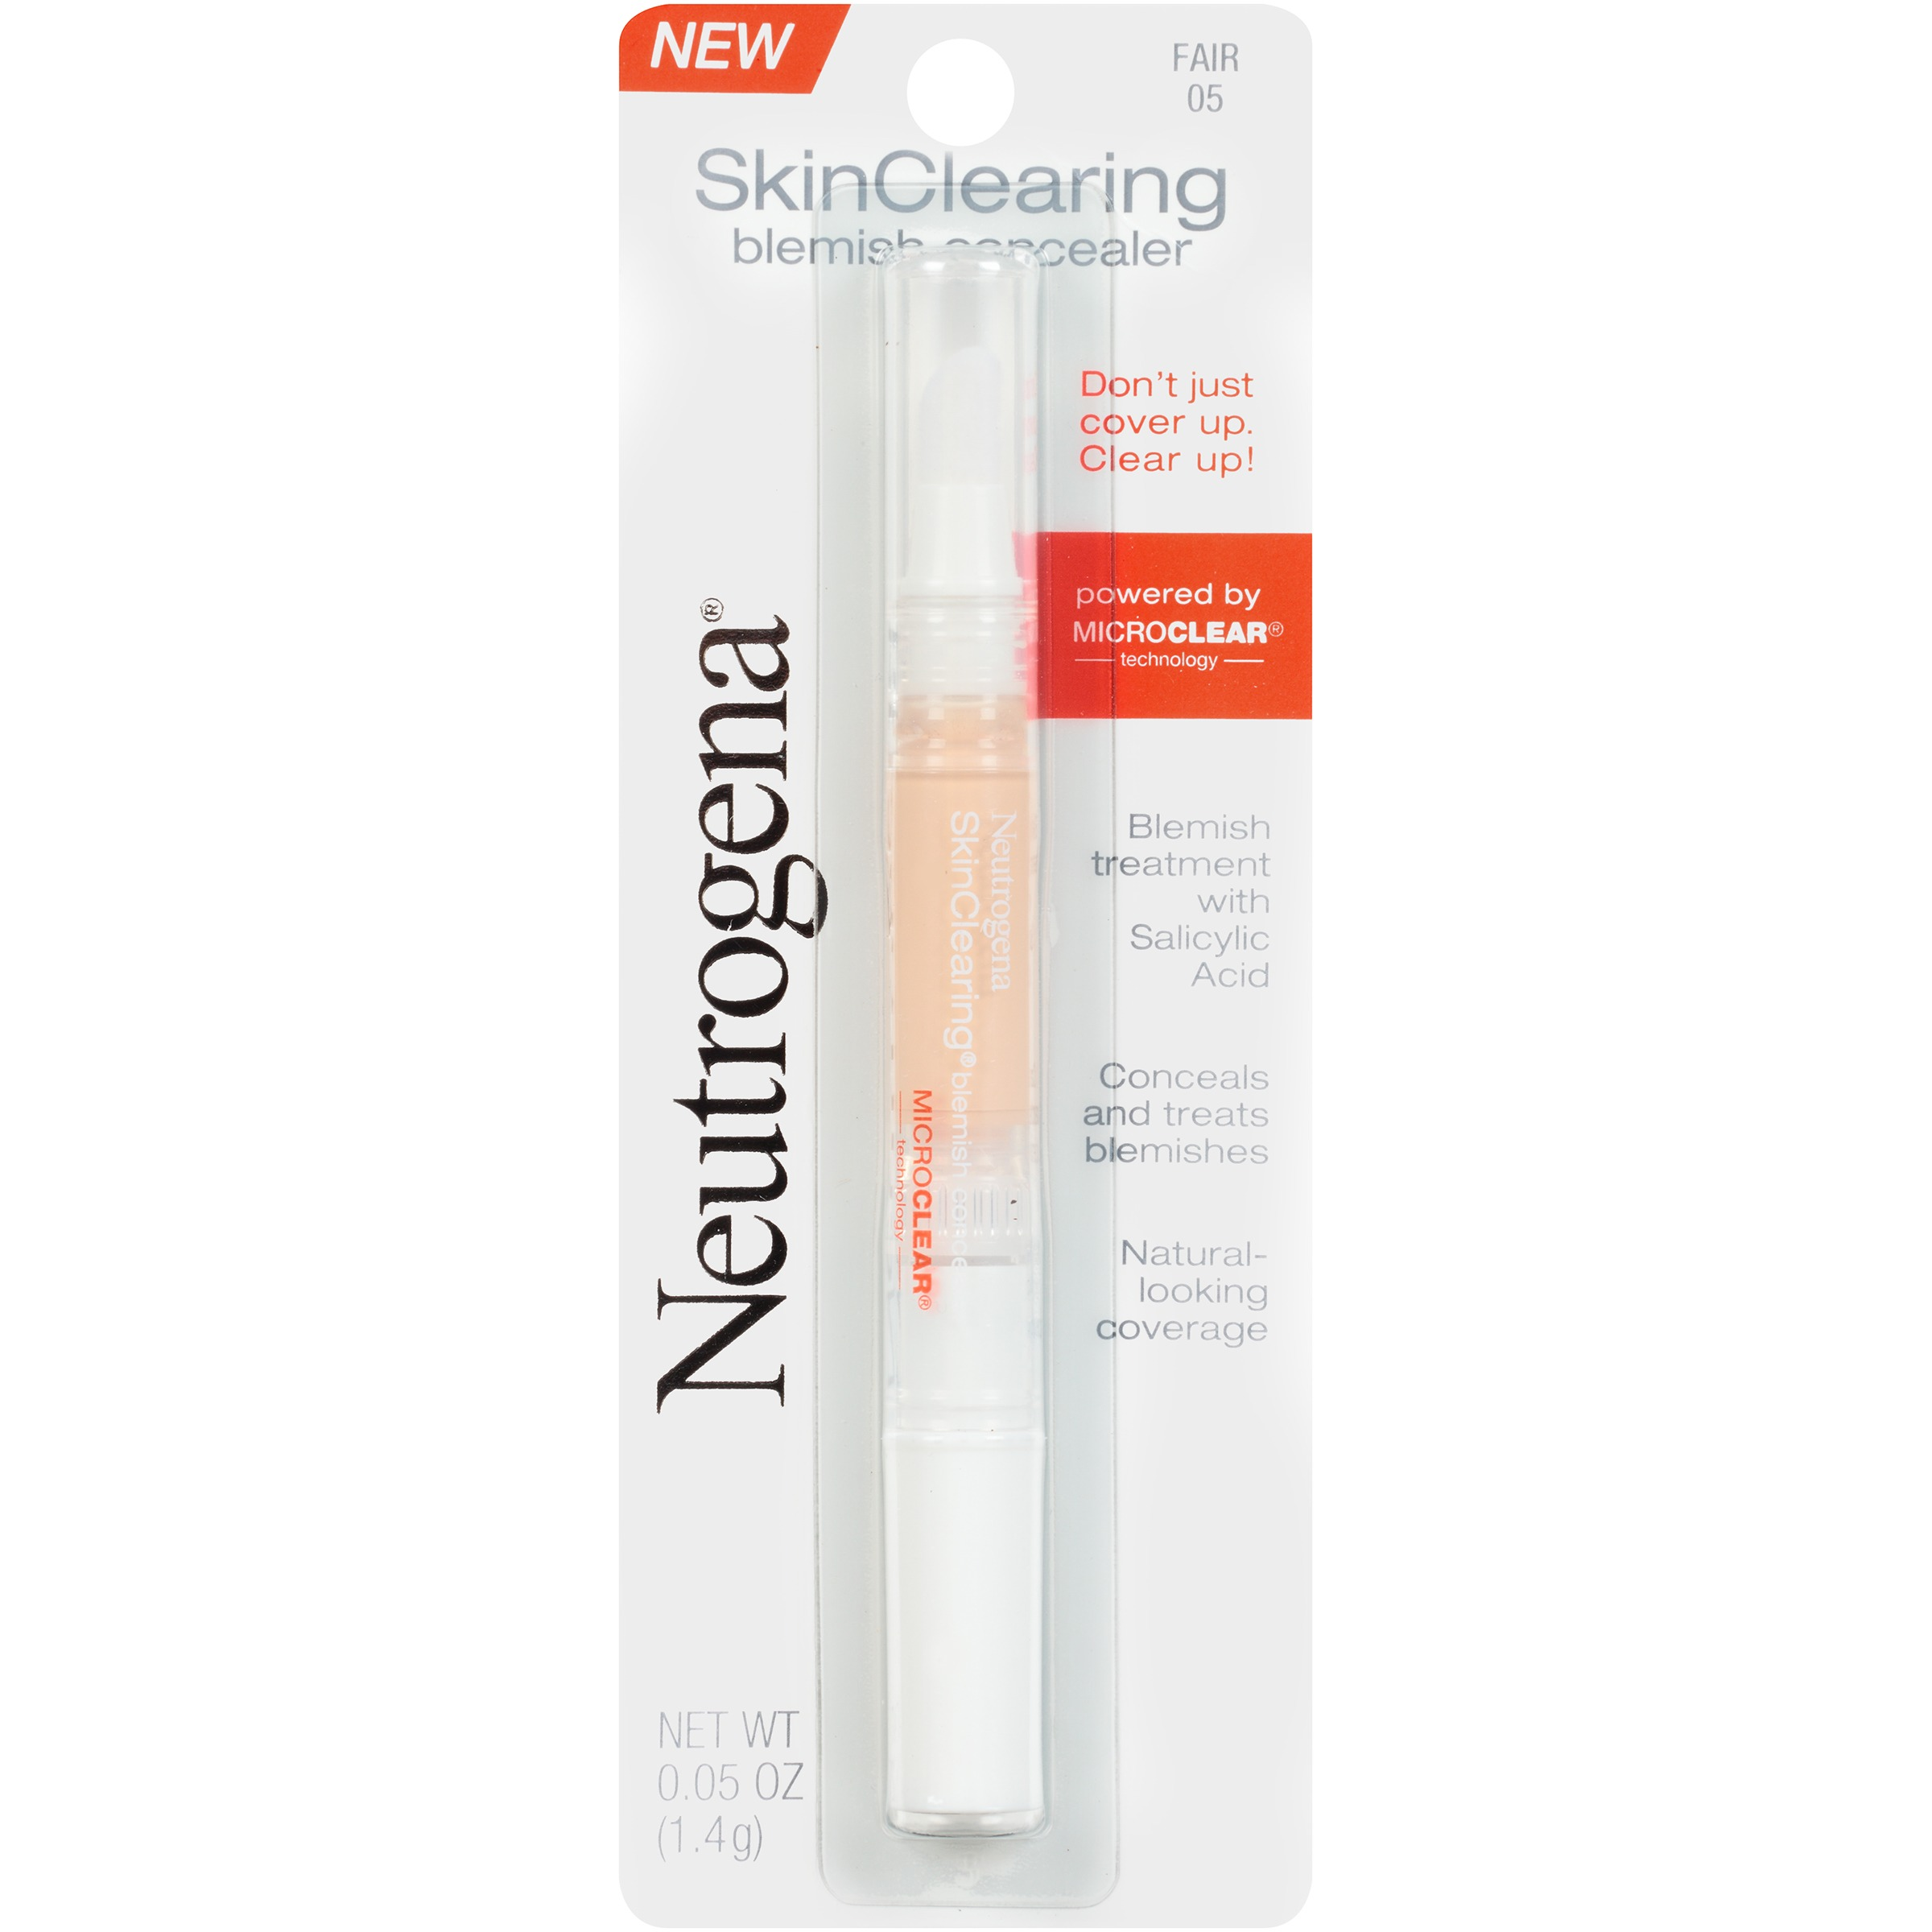 Neutrogena Skinclearing Blemish Concealer, Fair 05, .05 Oz